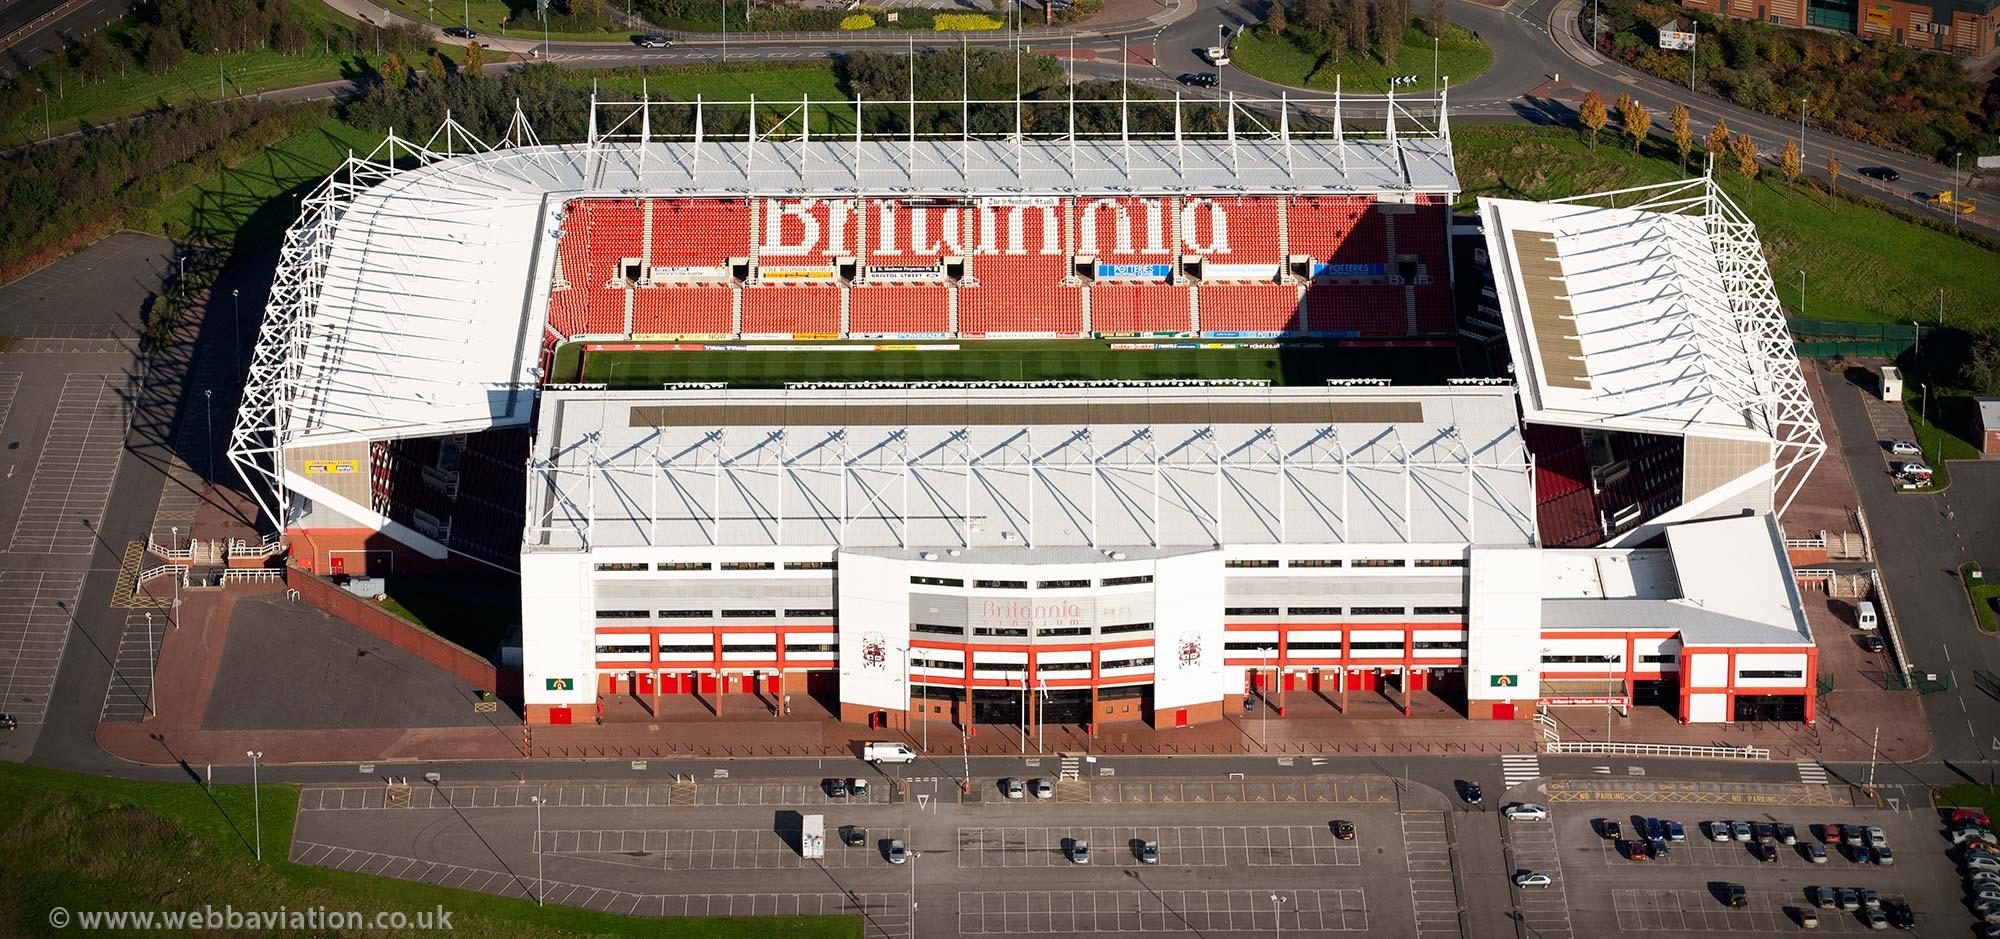 The bet365 Stadium football stadium , aka Britannia Stadium